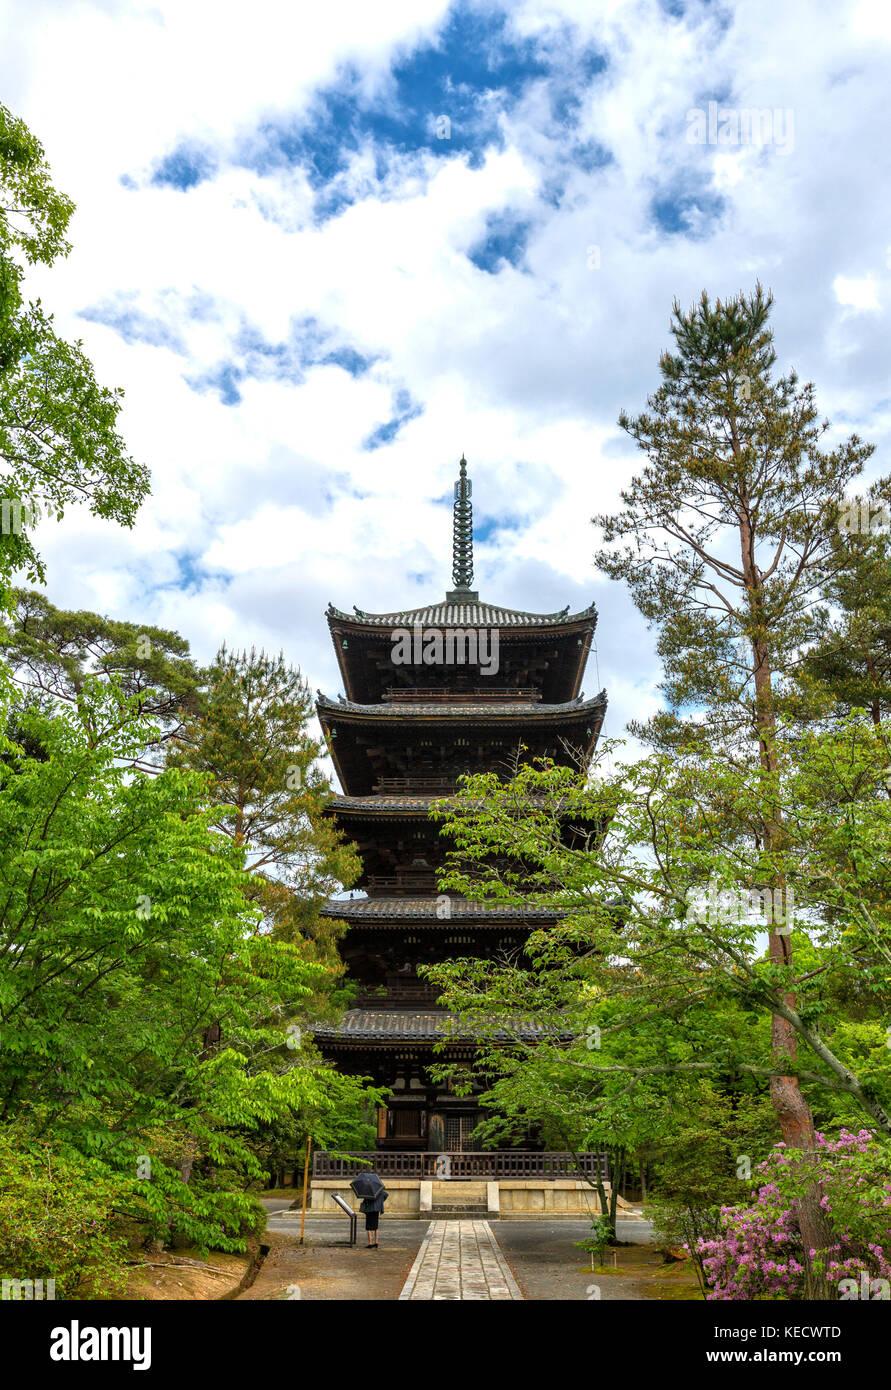 Ninna-ji Pagoda in Kyoto Japan Asia - Stock Image